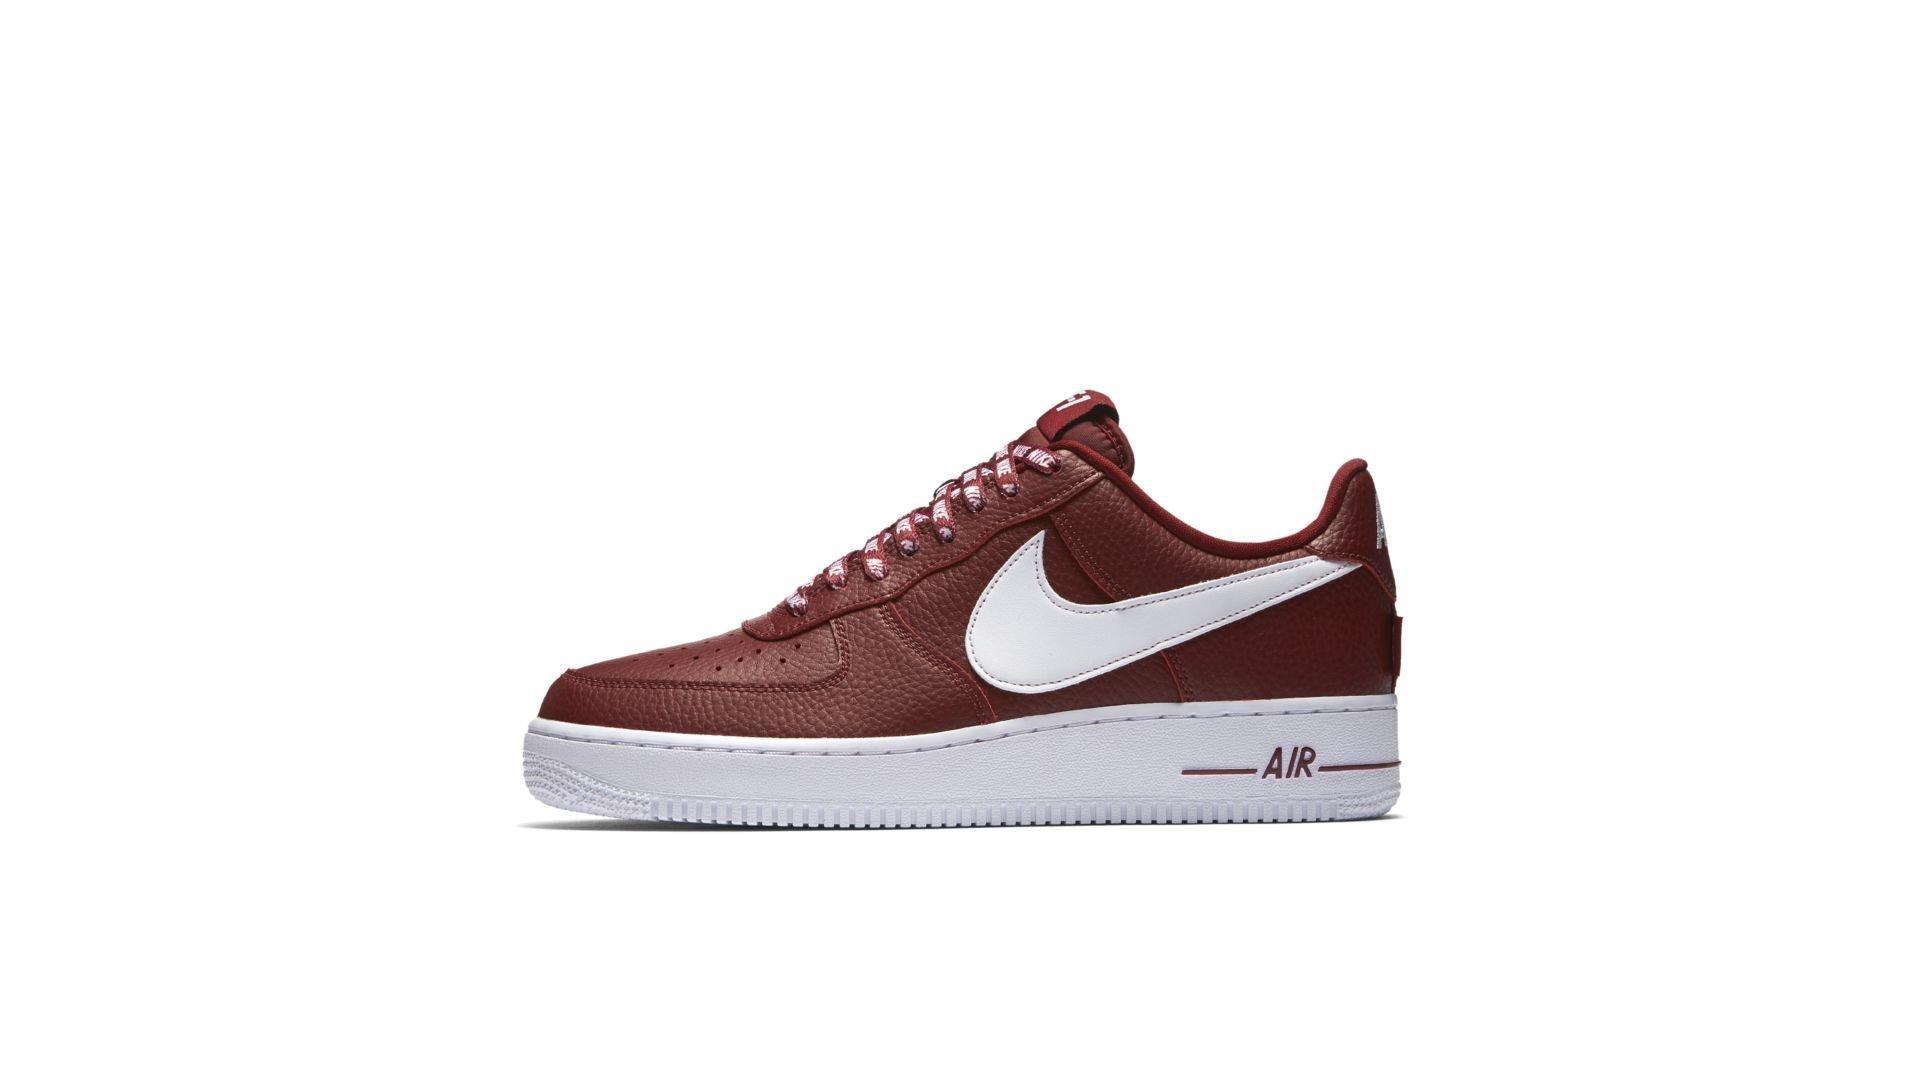 Nike Air Force 1 Low NBA Team Red (823511-605)